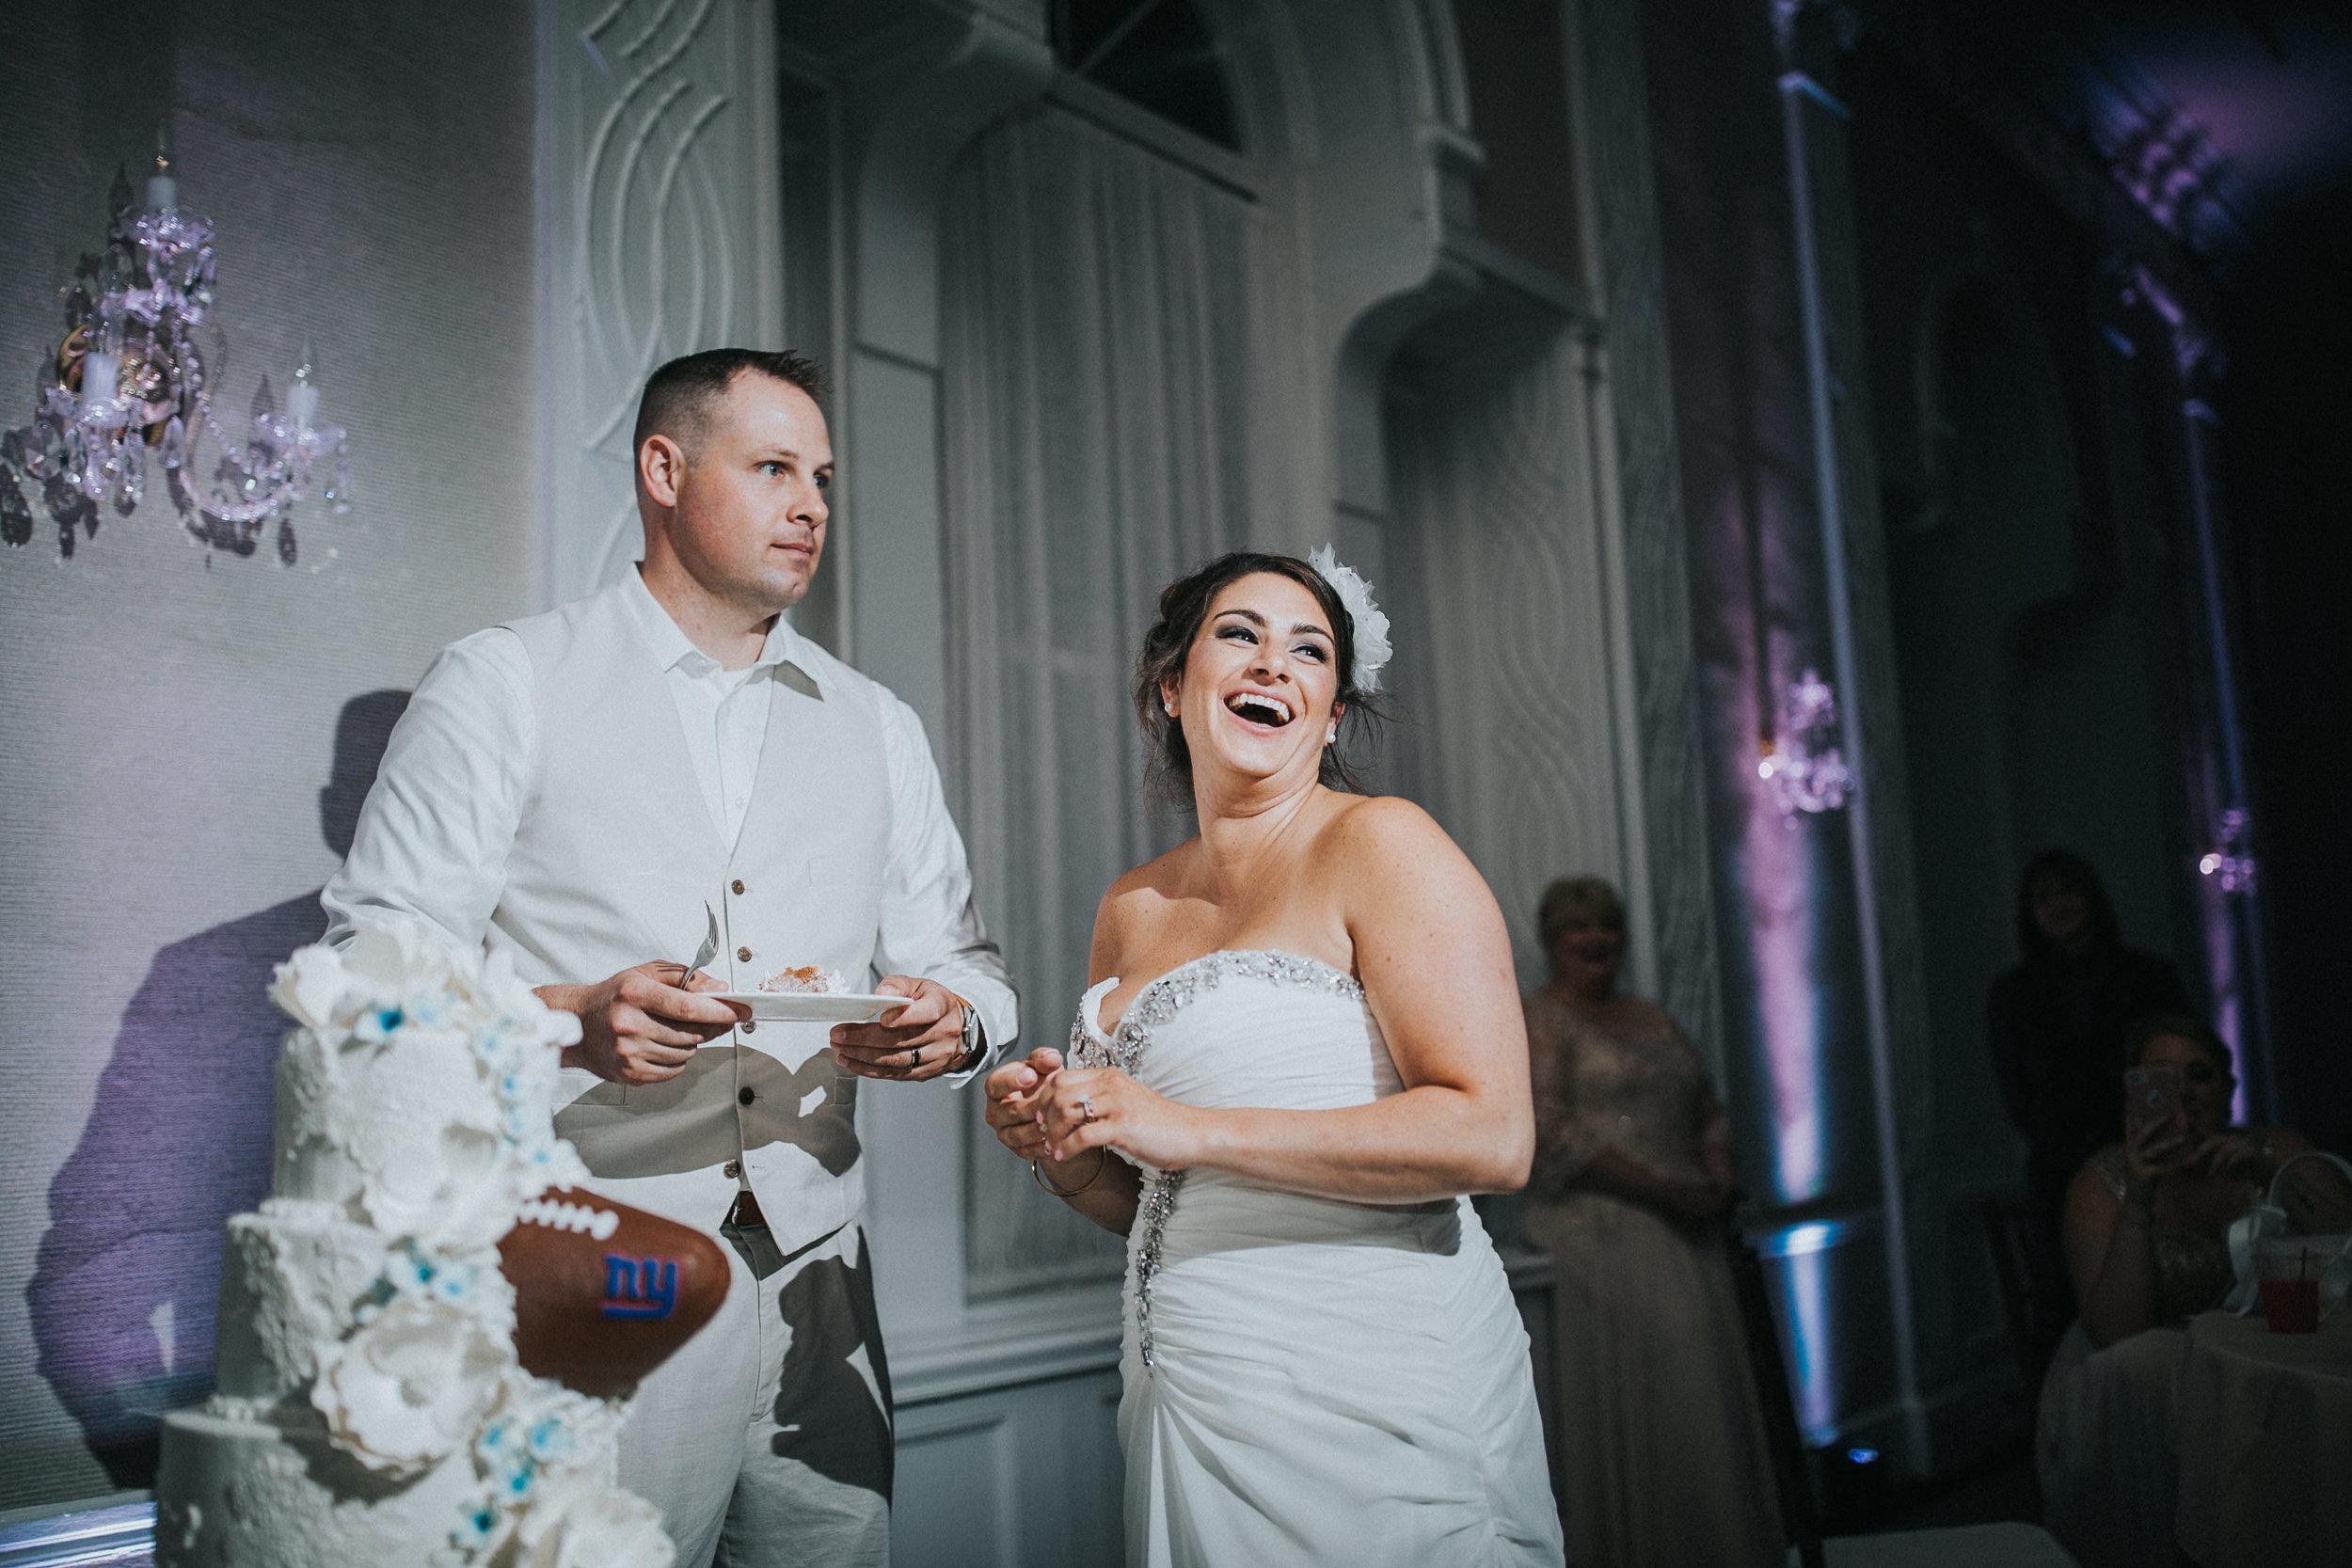 JennaLynnPhotography-NJWeddingPhotographer-Wedding-TheBerkeley-AsburyPark-Allison&Michael-Reception-199.jpg